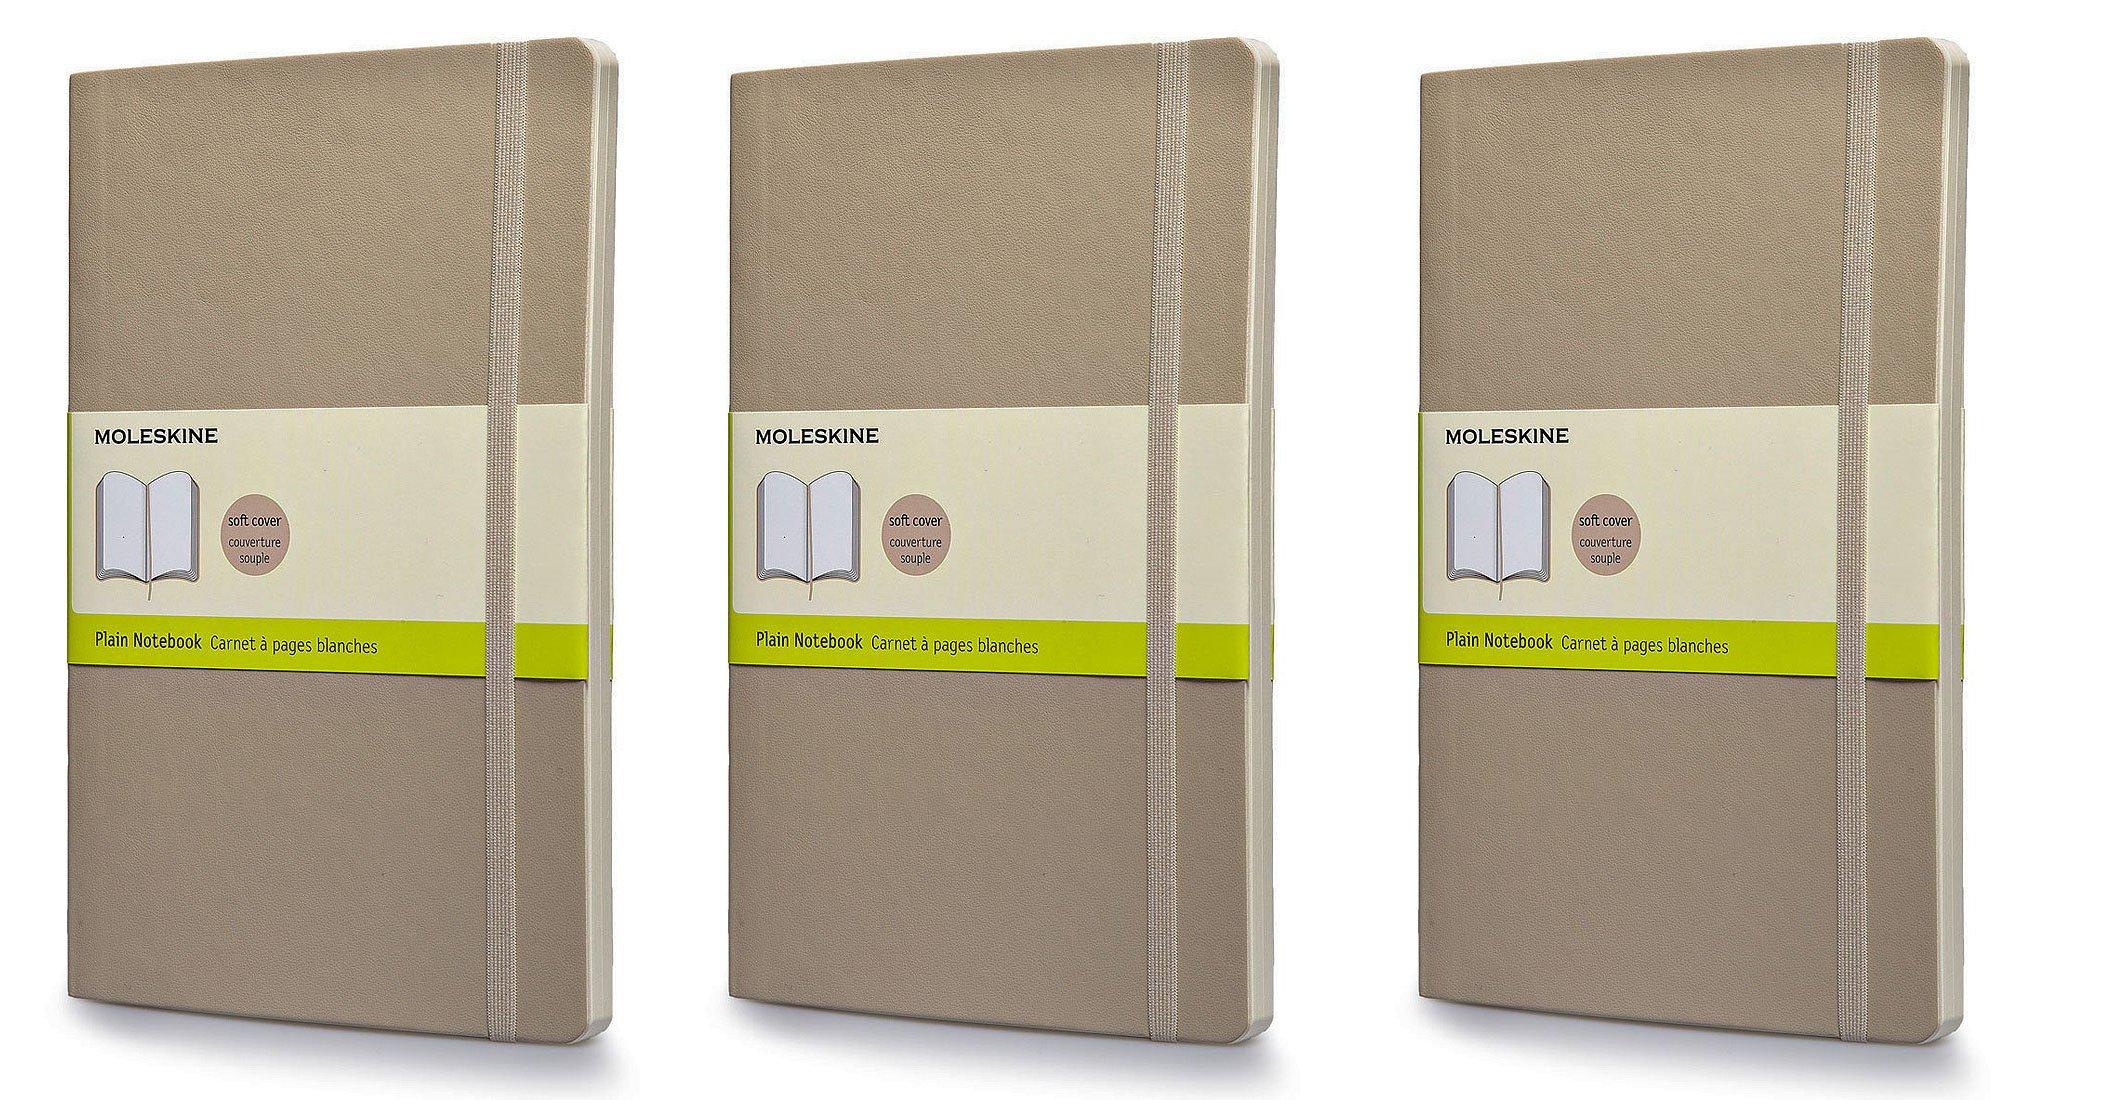 Pack of 3 Moleskine Classic Colored Notebook, Large, Plain, Khaki Beige, Soft Cover (5'' x 8-1/4'')